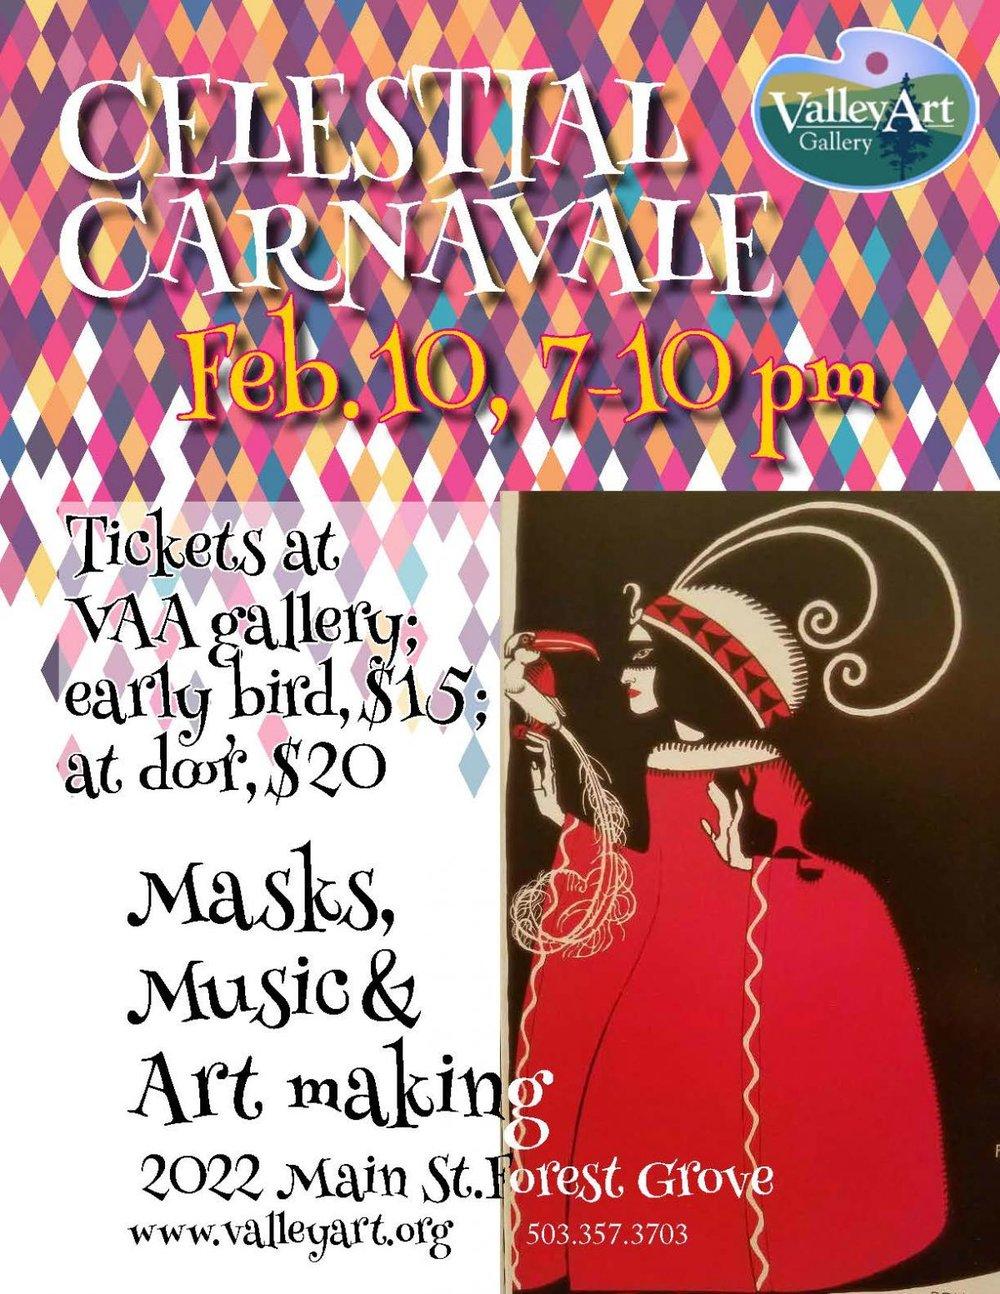 carnavale2018_flyer.jpg